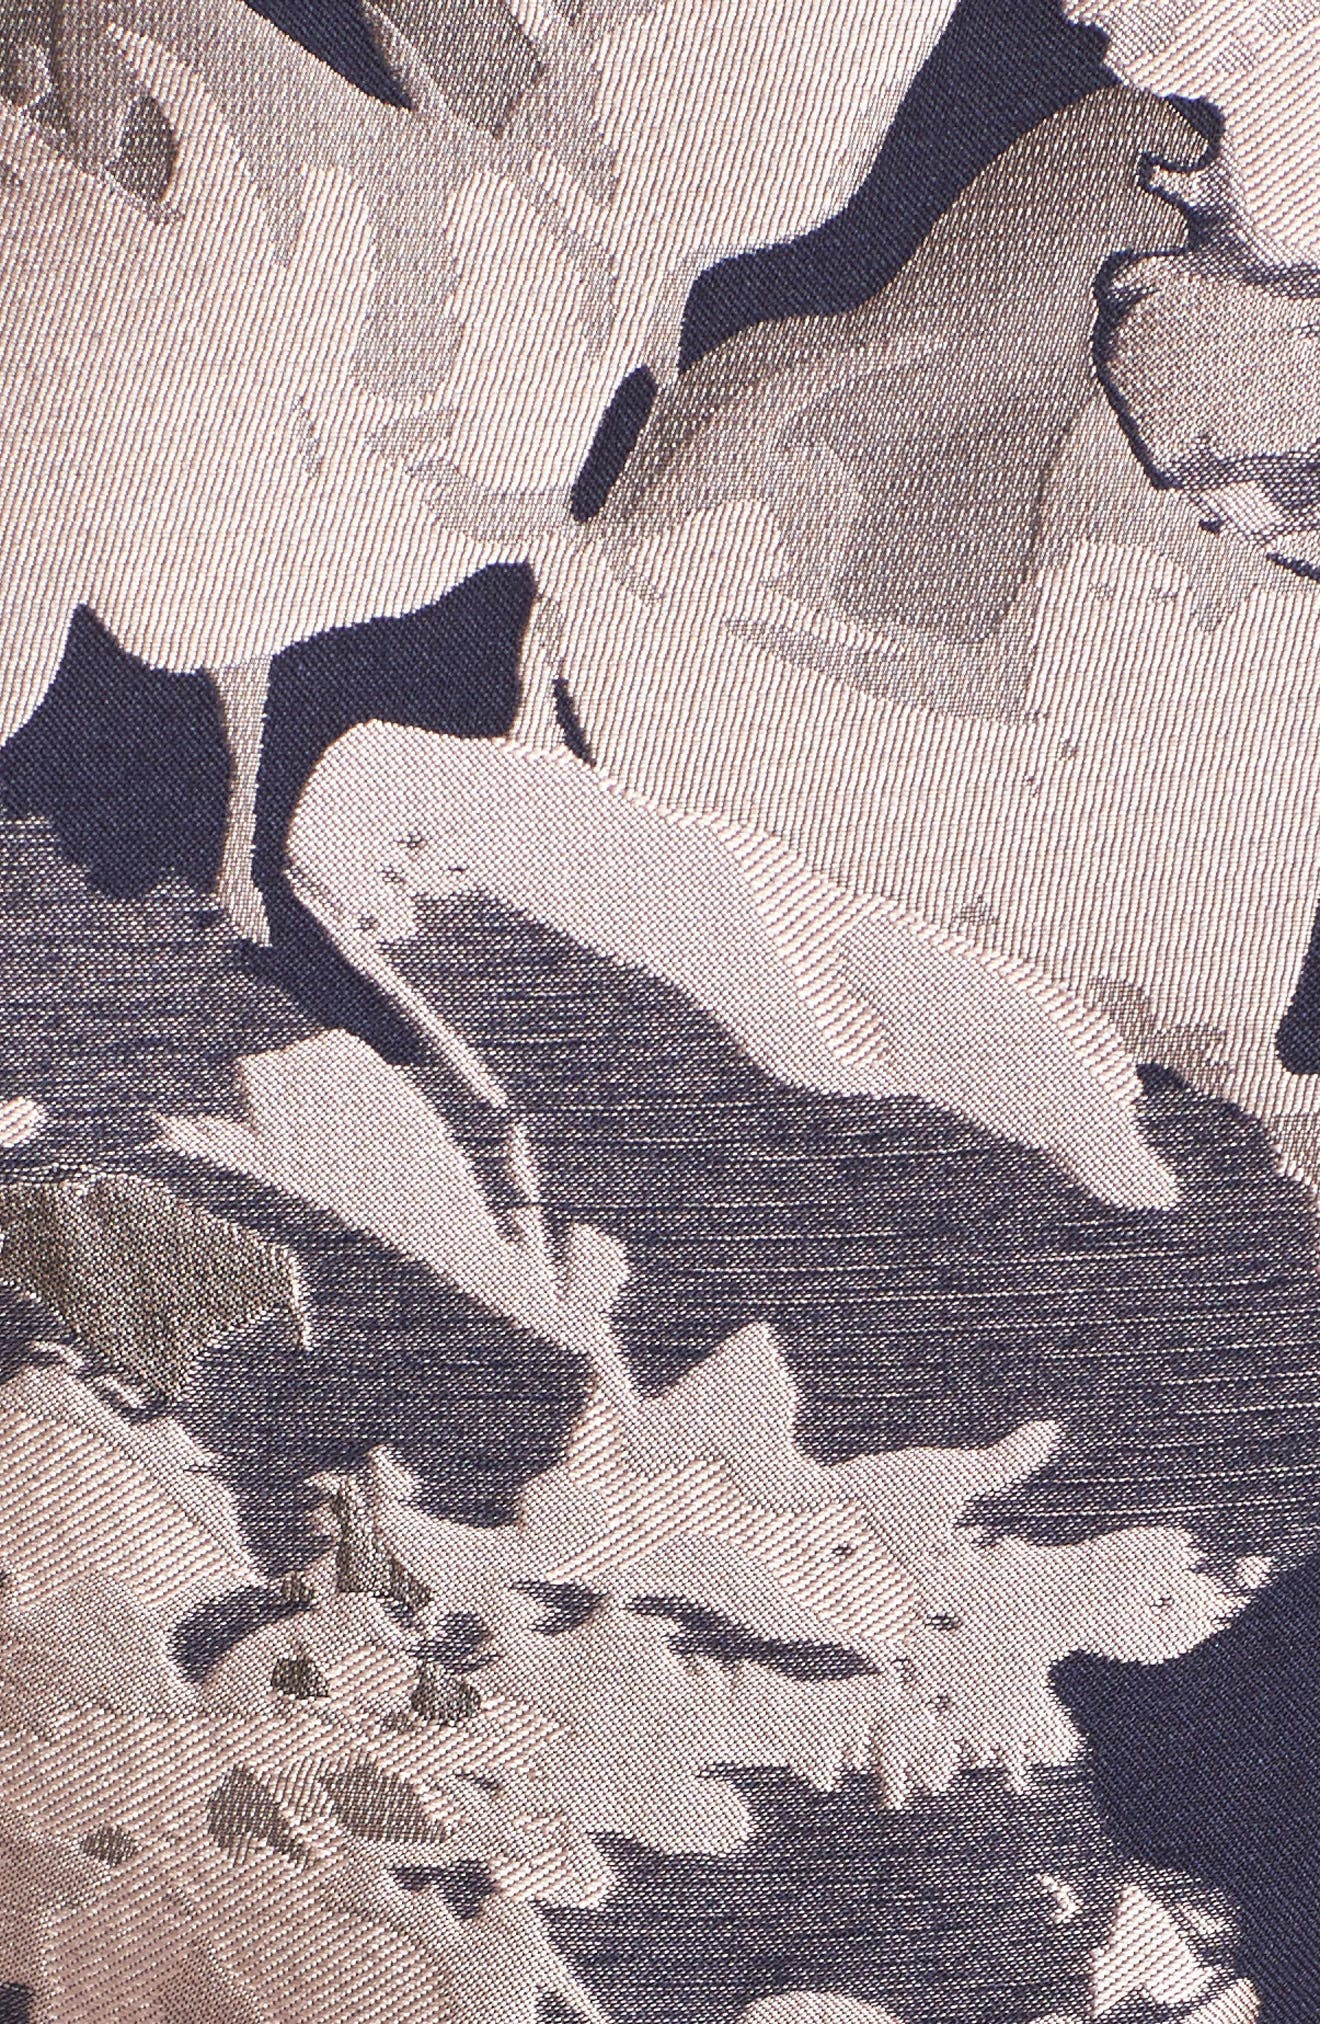 Belted Brocade A-Line Dress,                             Alternate thumbnail 5, color,                             410